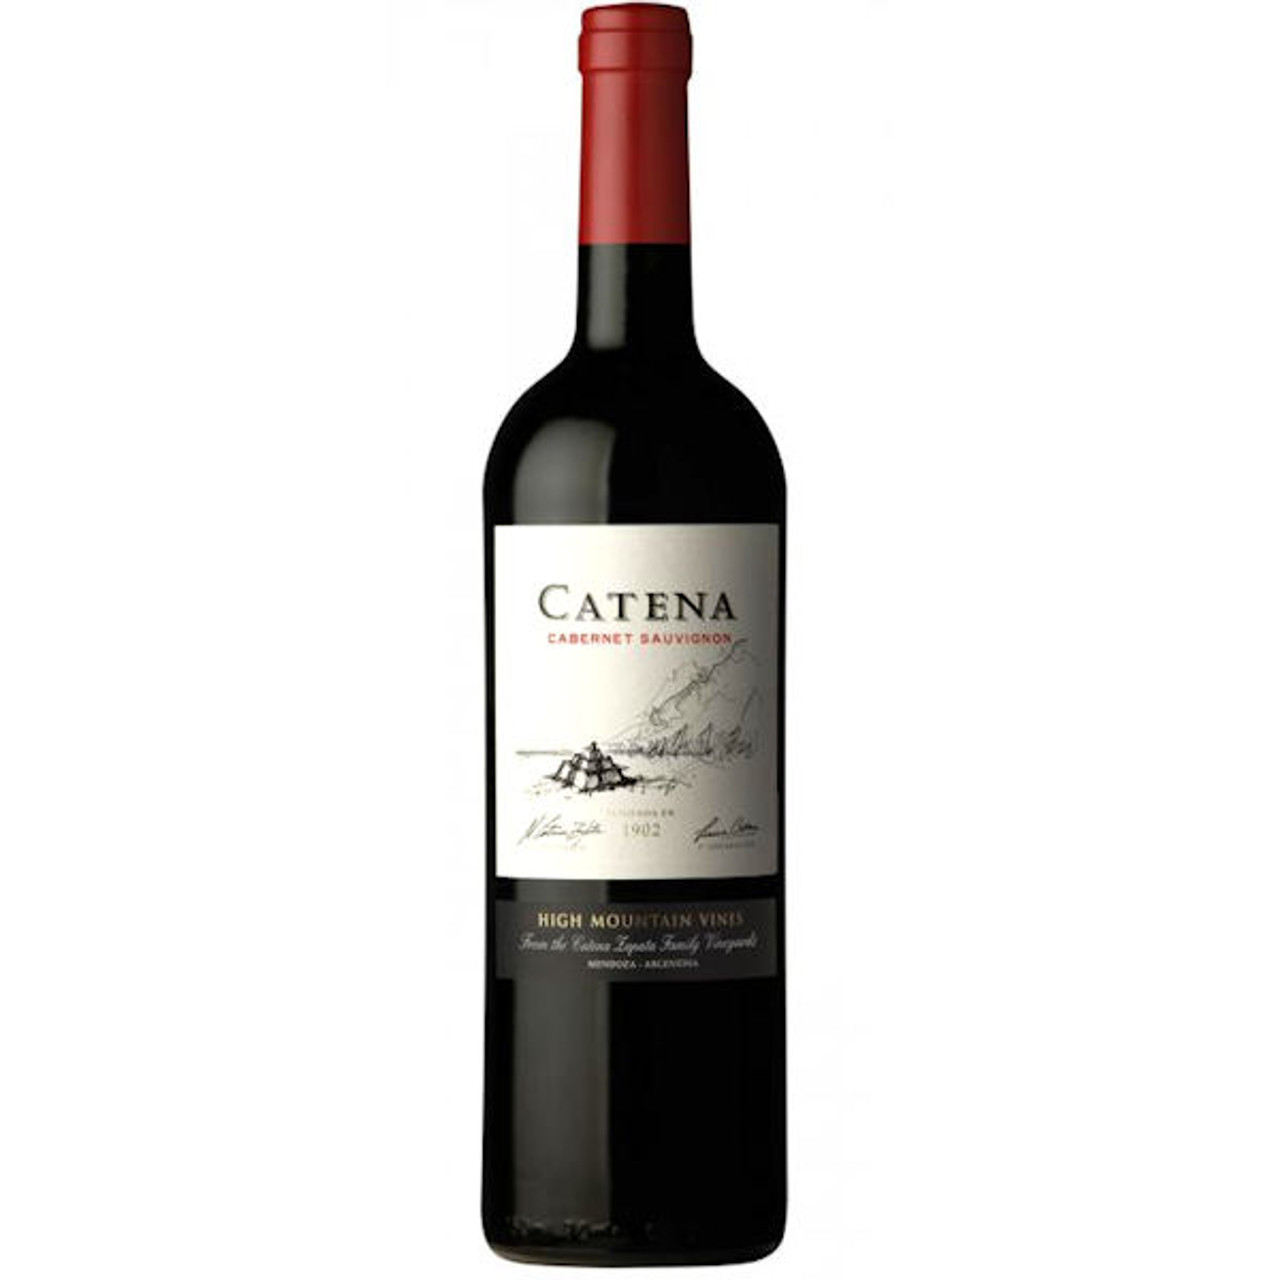 Catena High Mountain Vines Mendoza Cabernet